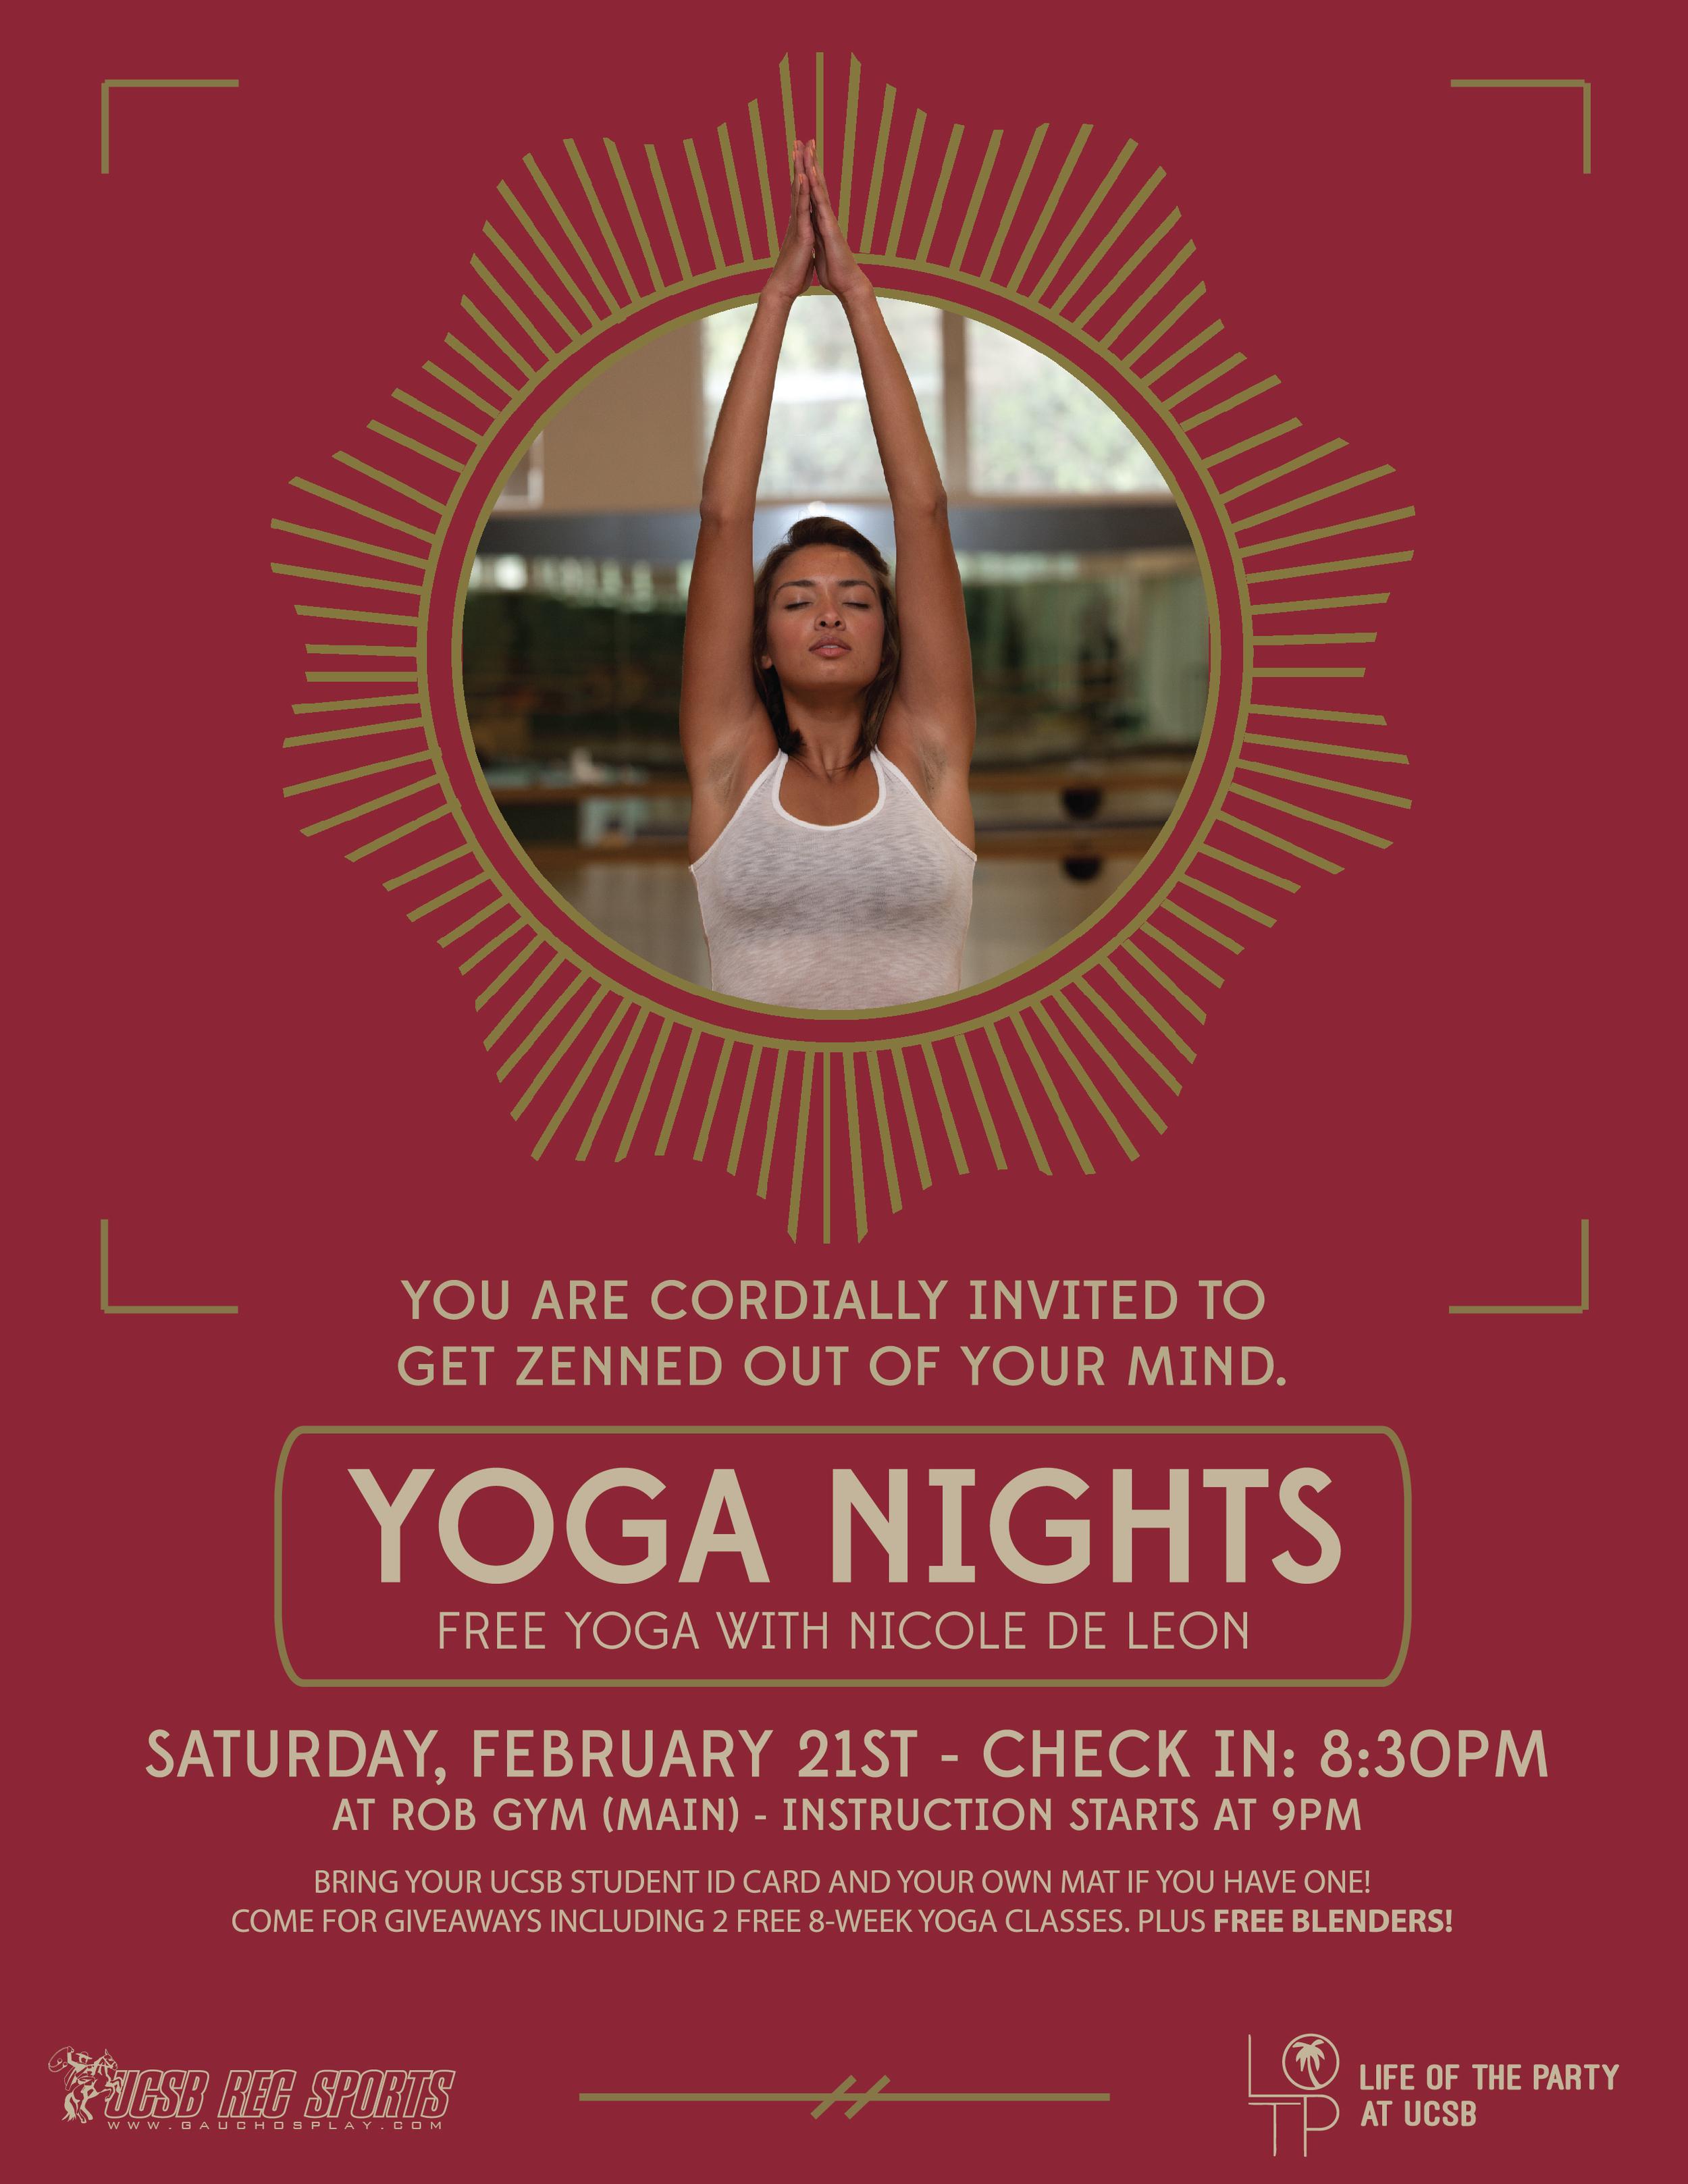 Yoga Nights_8.5x11_WITHPHOTO-01-01.jpg